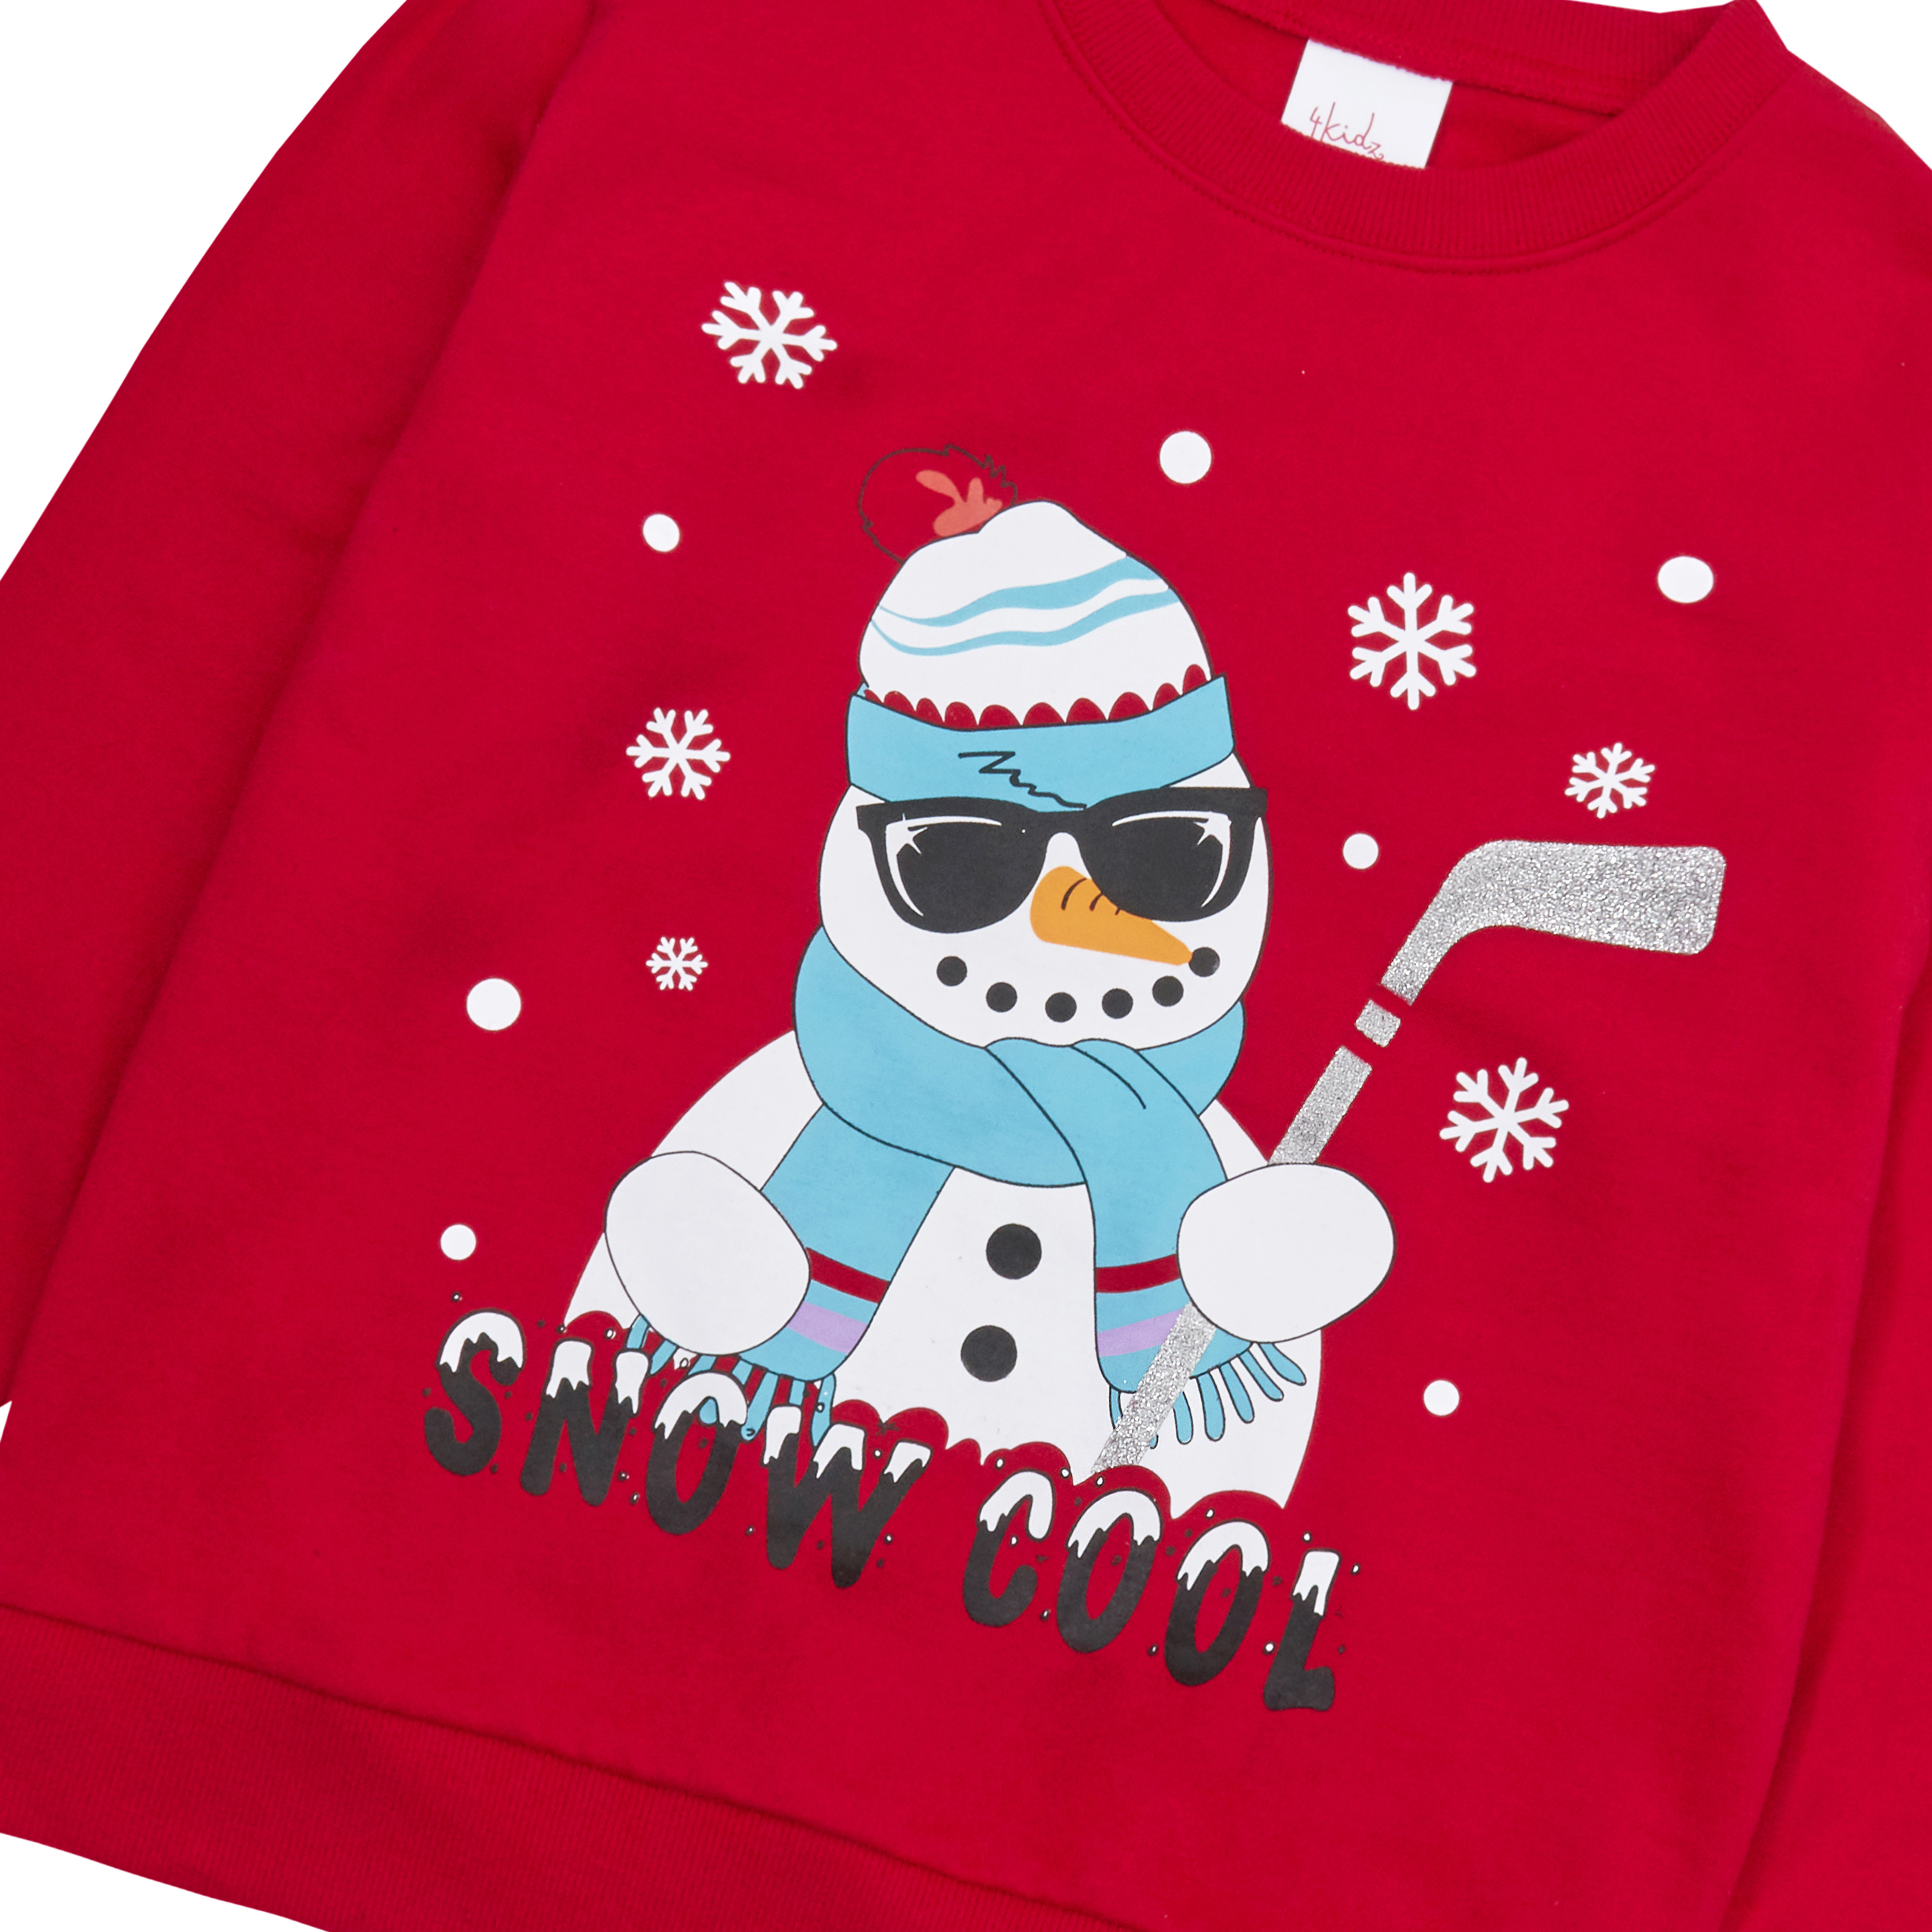 Enfants-Garcons-Filles-Noel-Noel-Pull-Sweat-shirt-Carlin-Glitter-chaud miniature 19